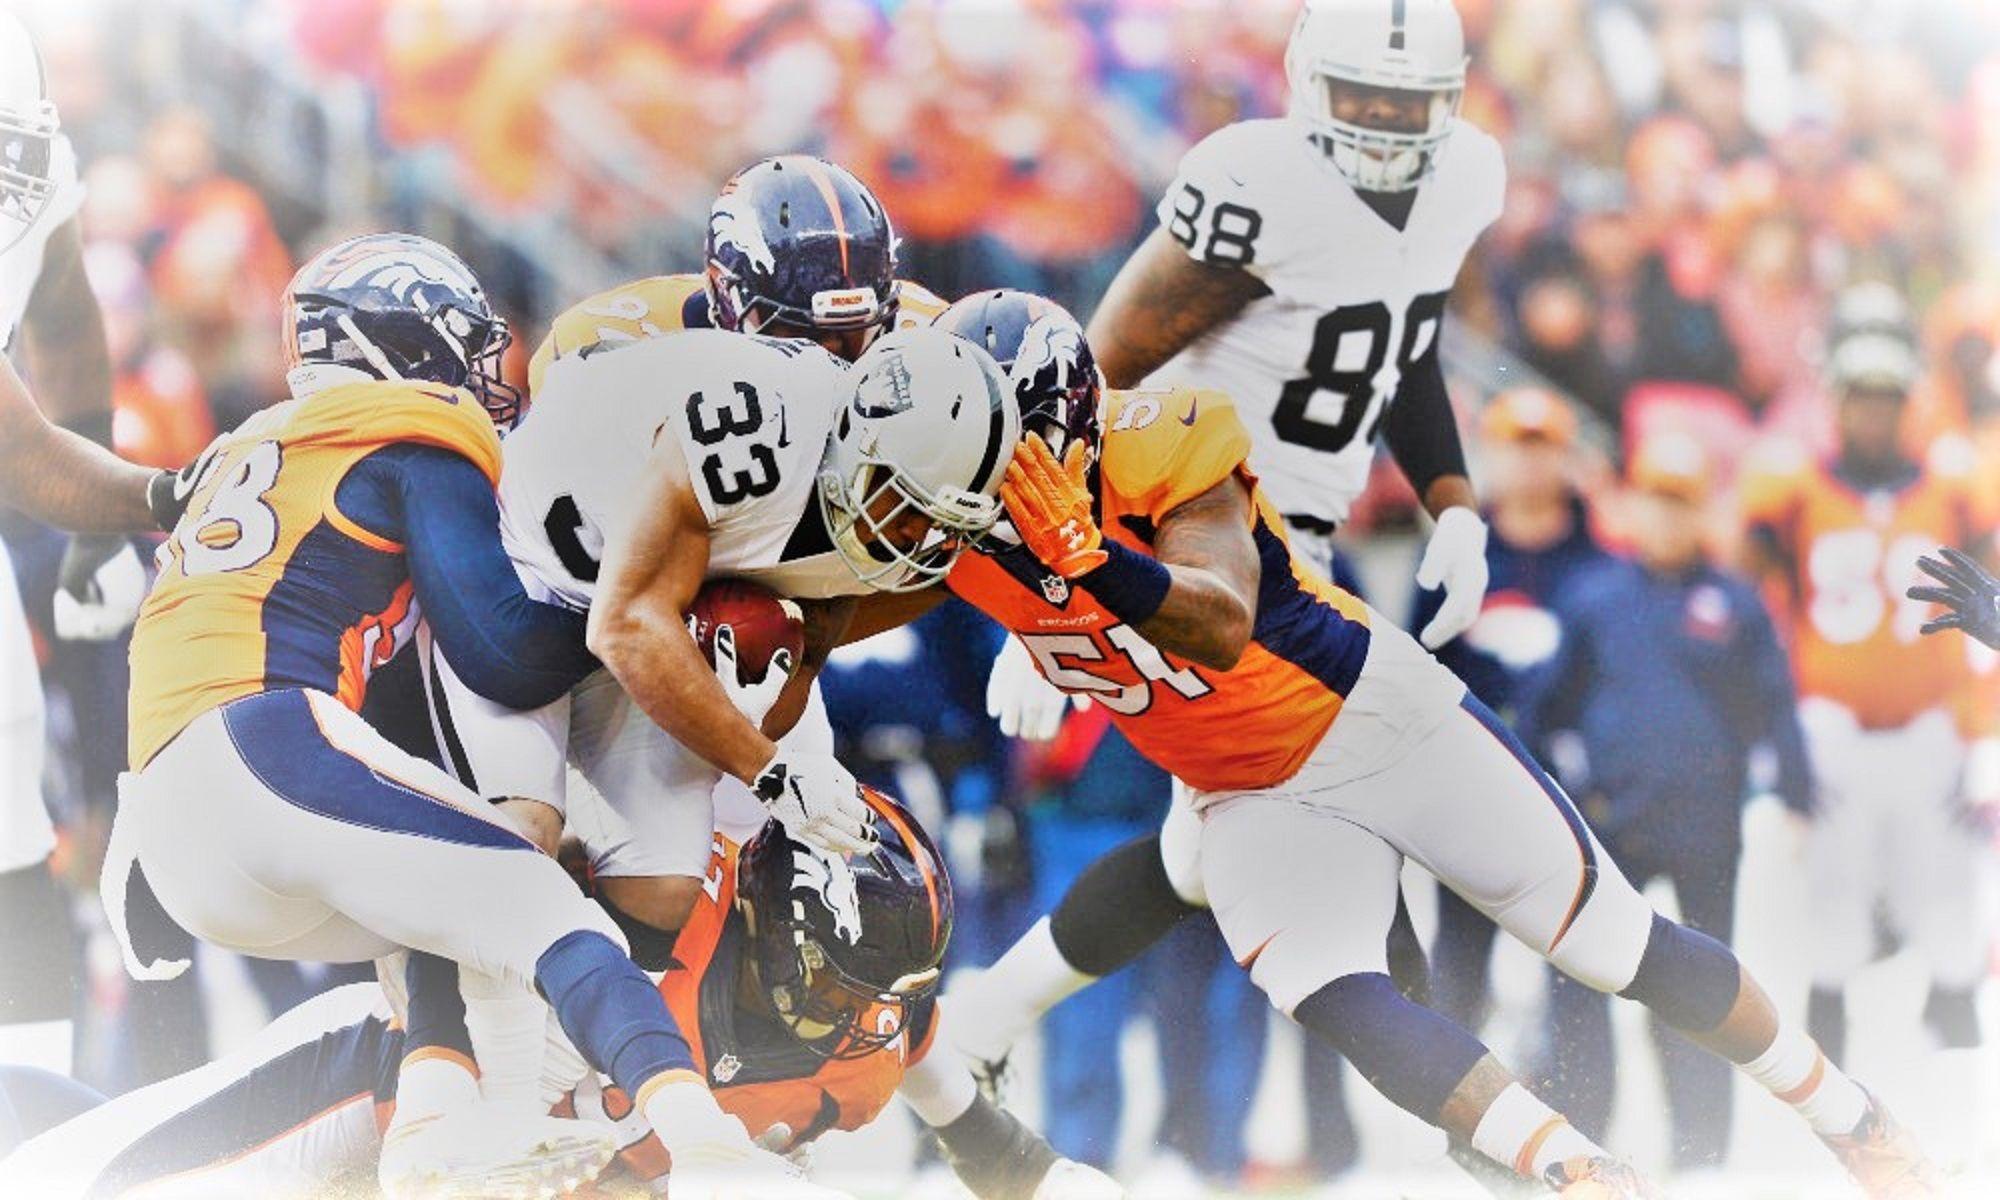 Watch Here Denver Broncos vs. Oakland Raiders Live